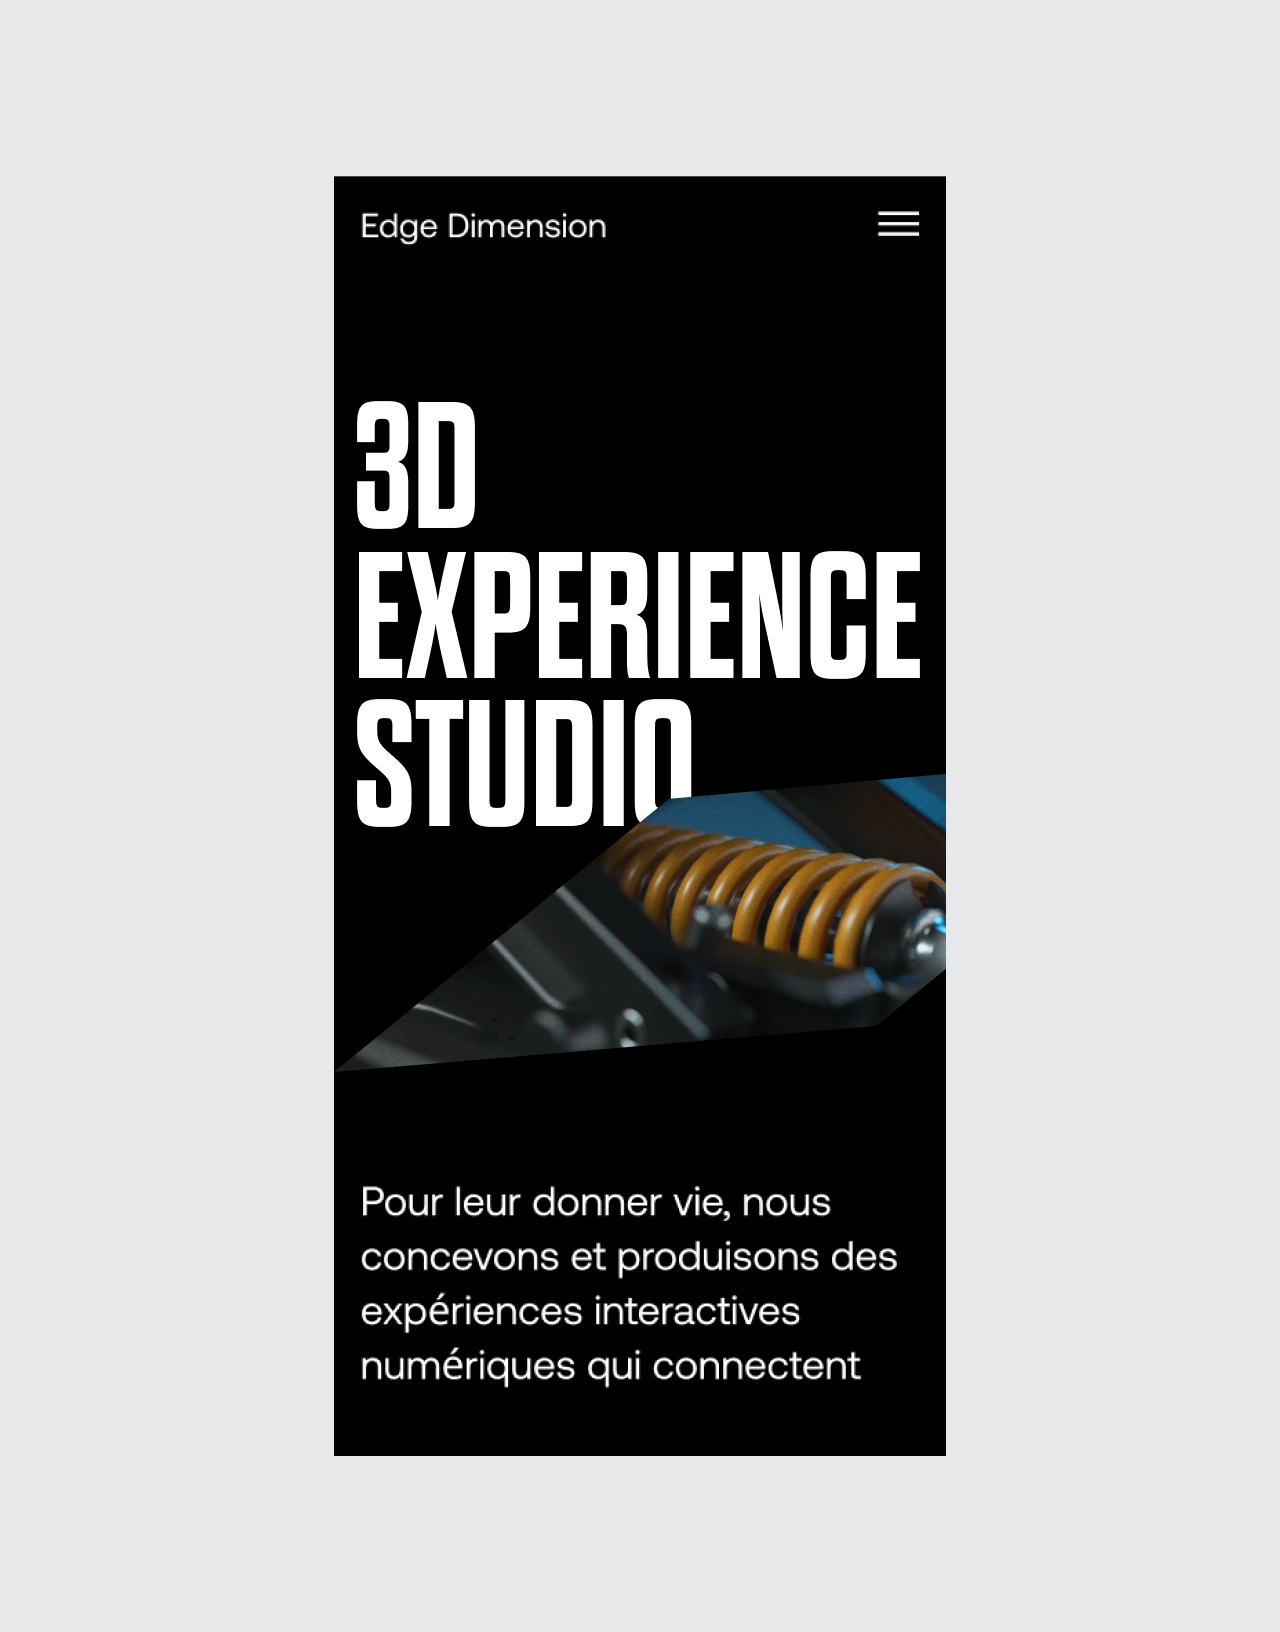 Edge Dimension mobile website